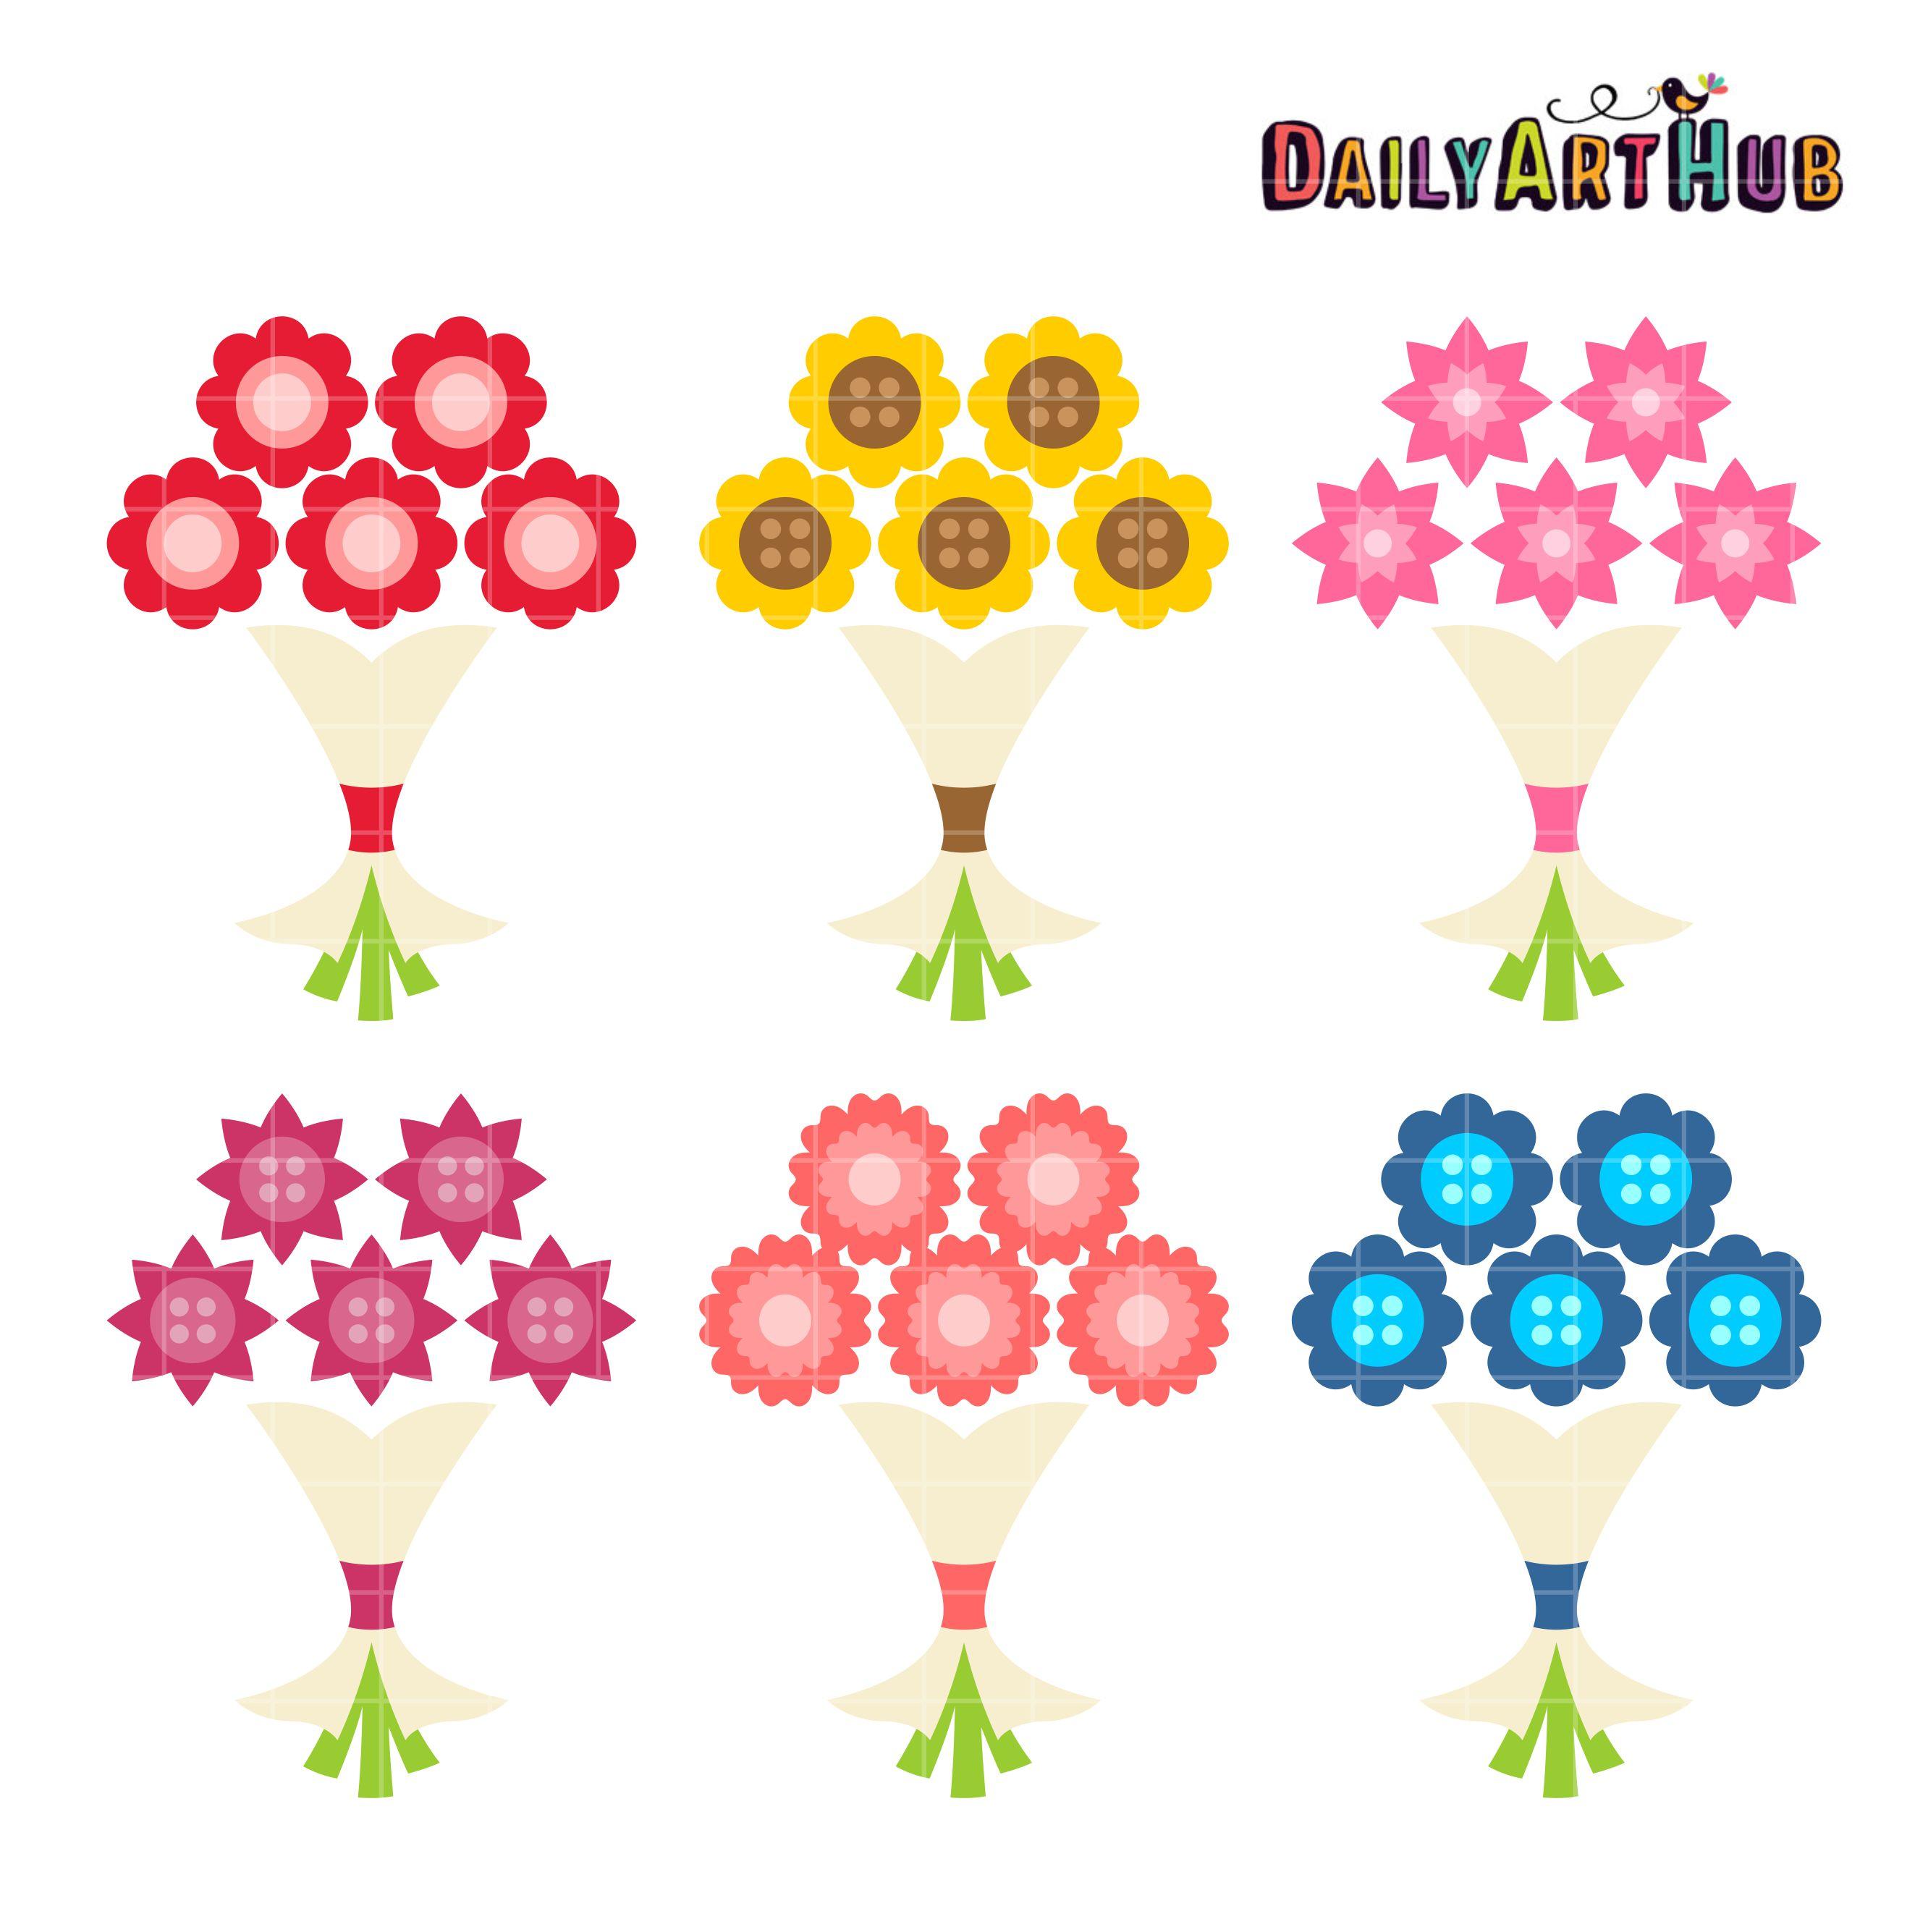 Simple Flower Bouquet Clip Art Set | Daily Art Hub